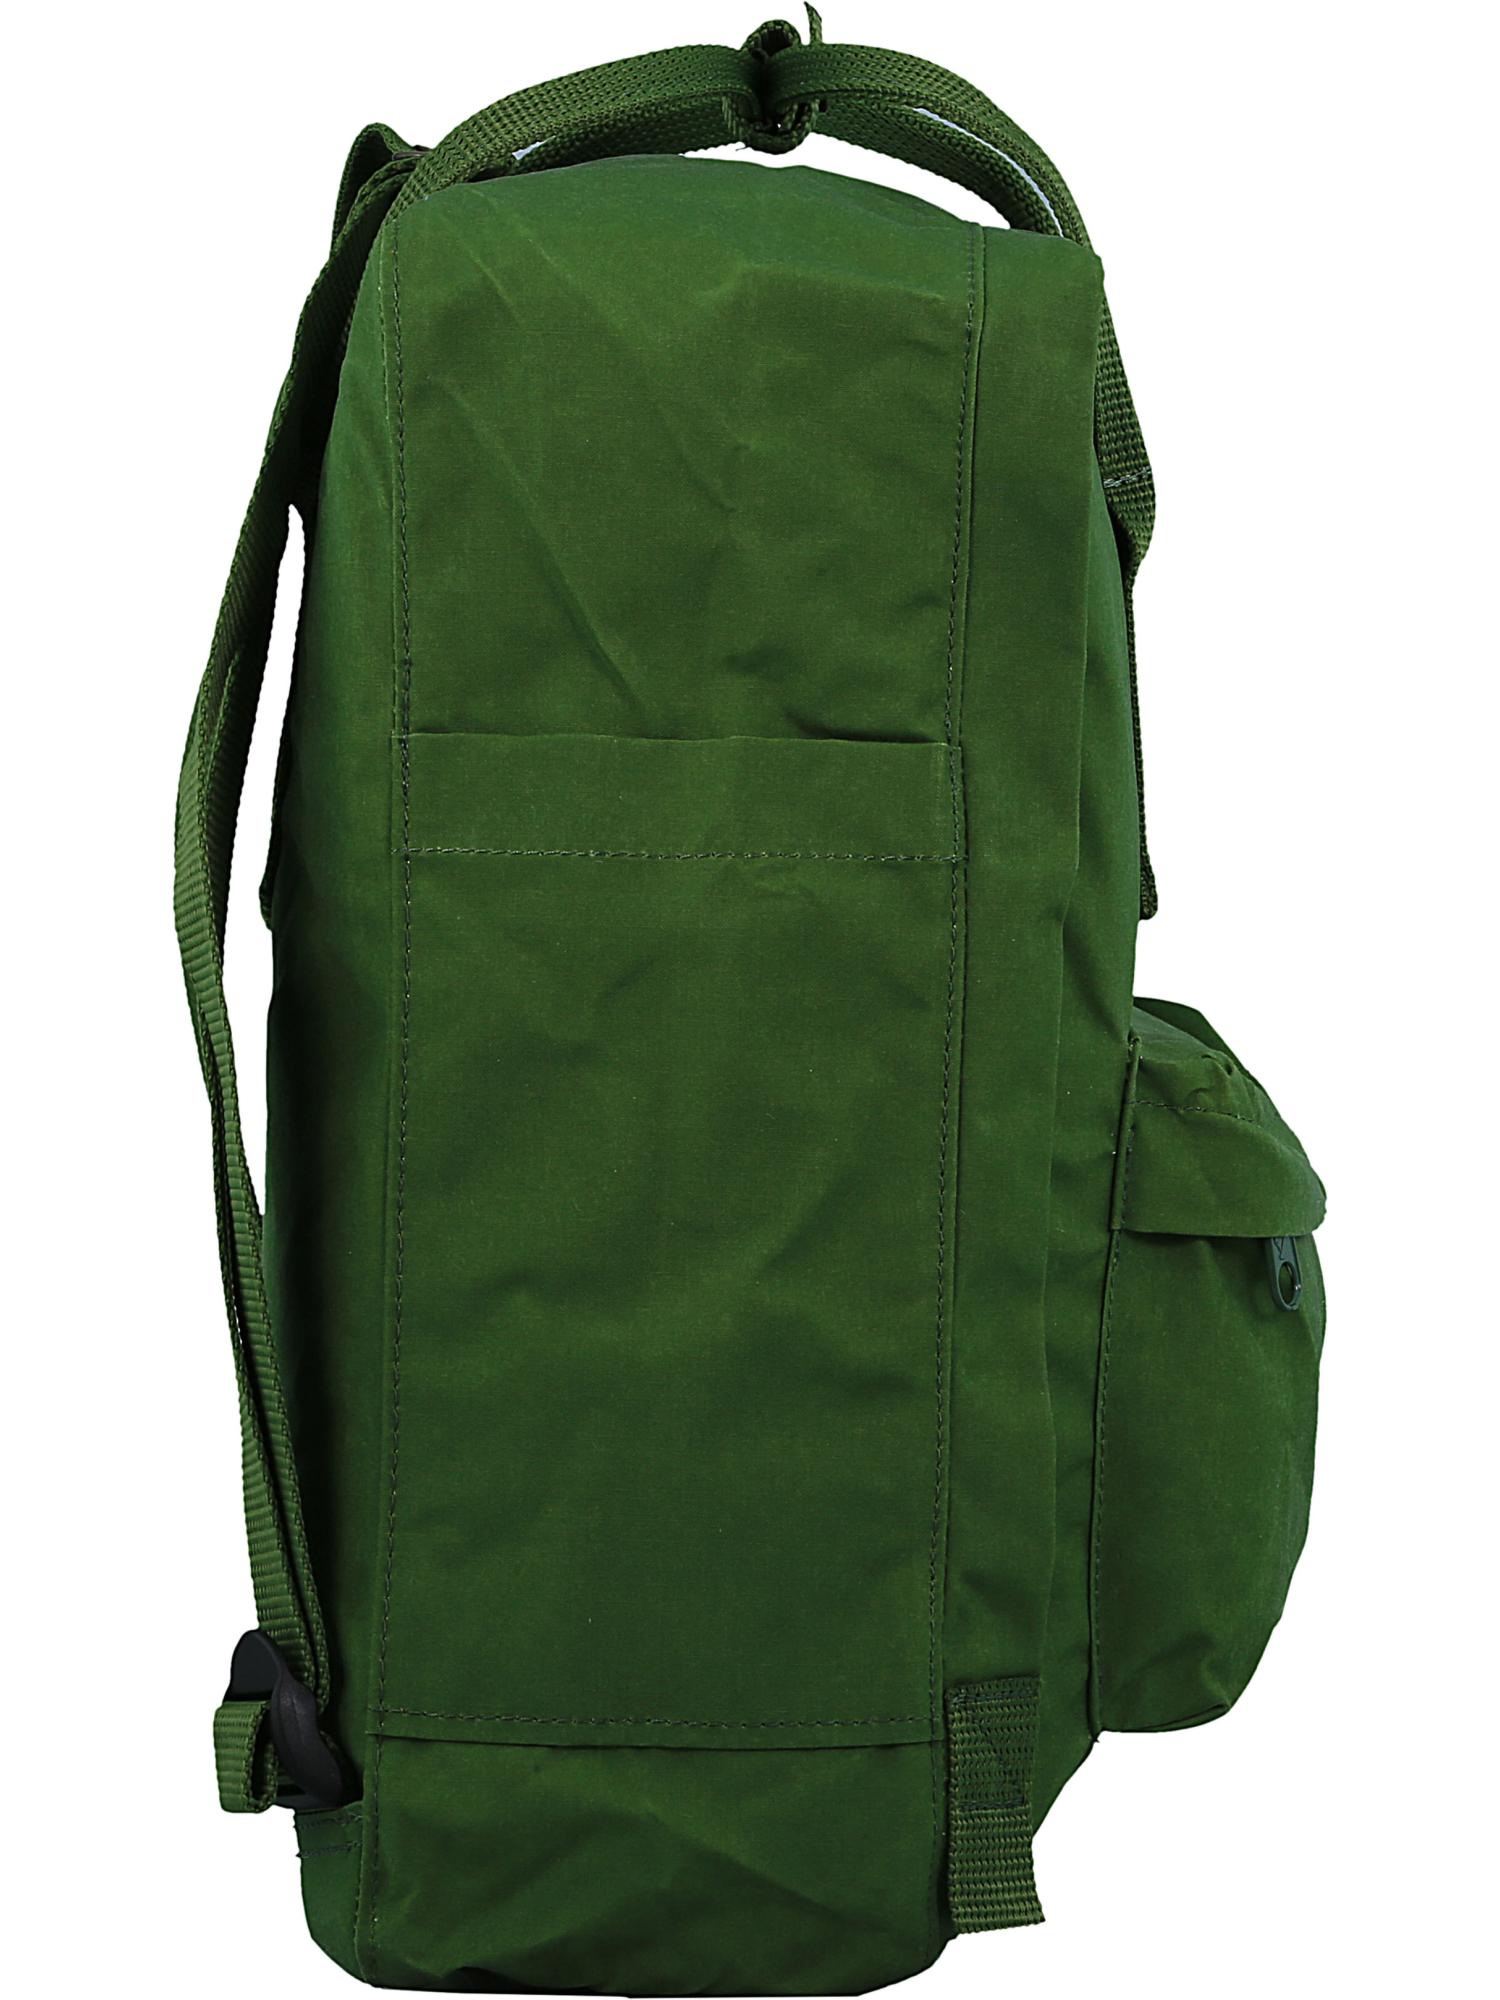 Fjallraven Kanken Classic Fabric Backpack Ebay Birch Green